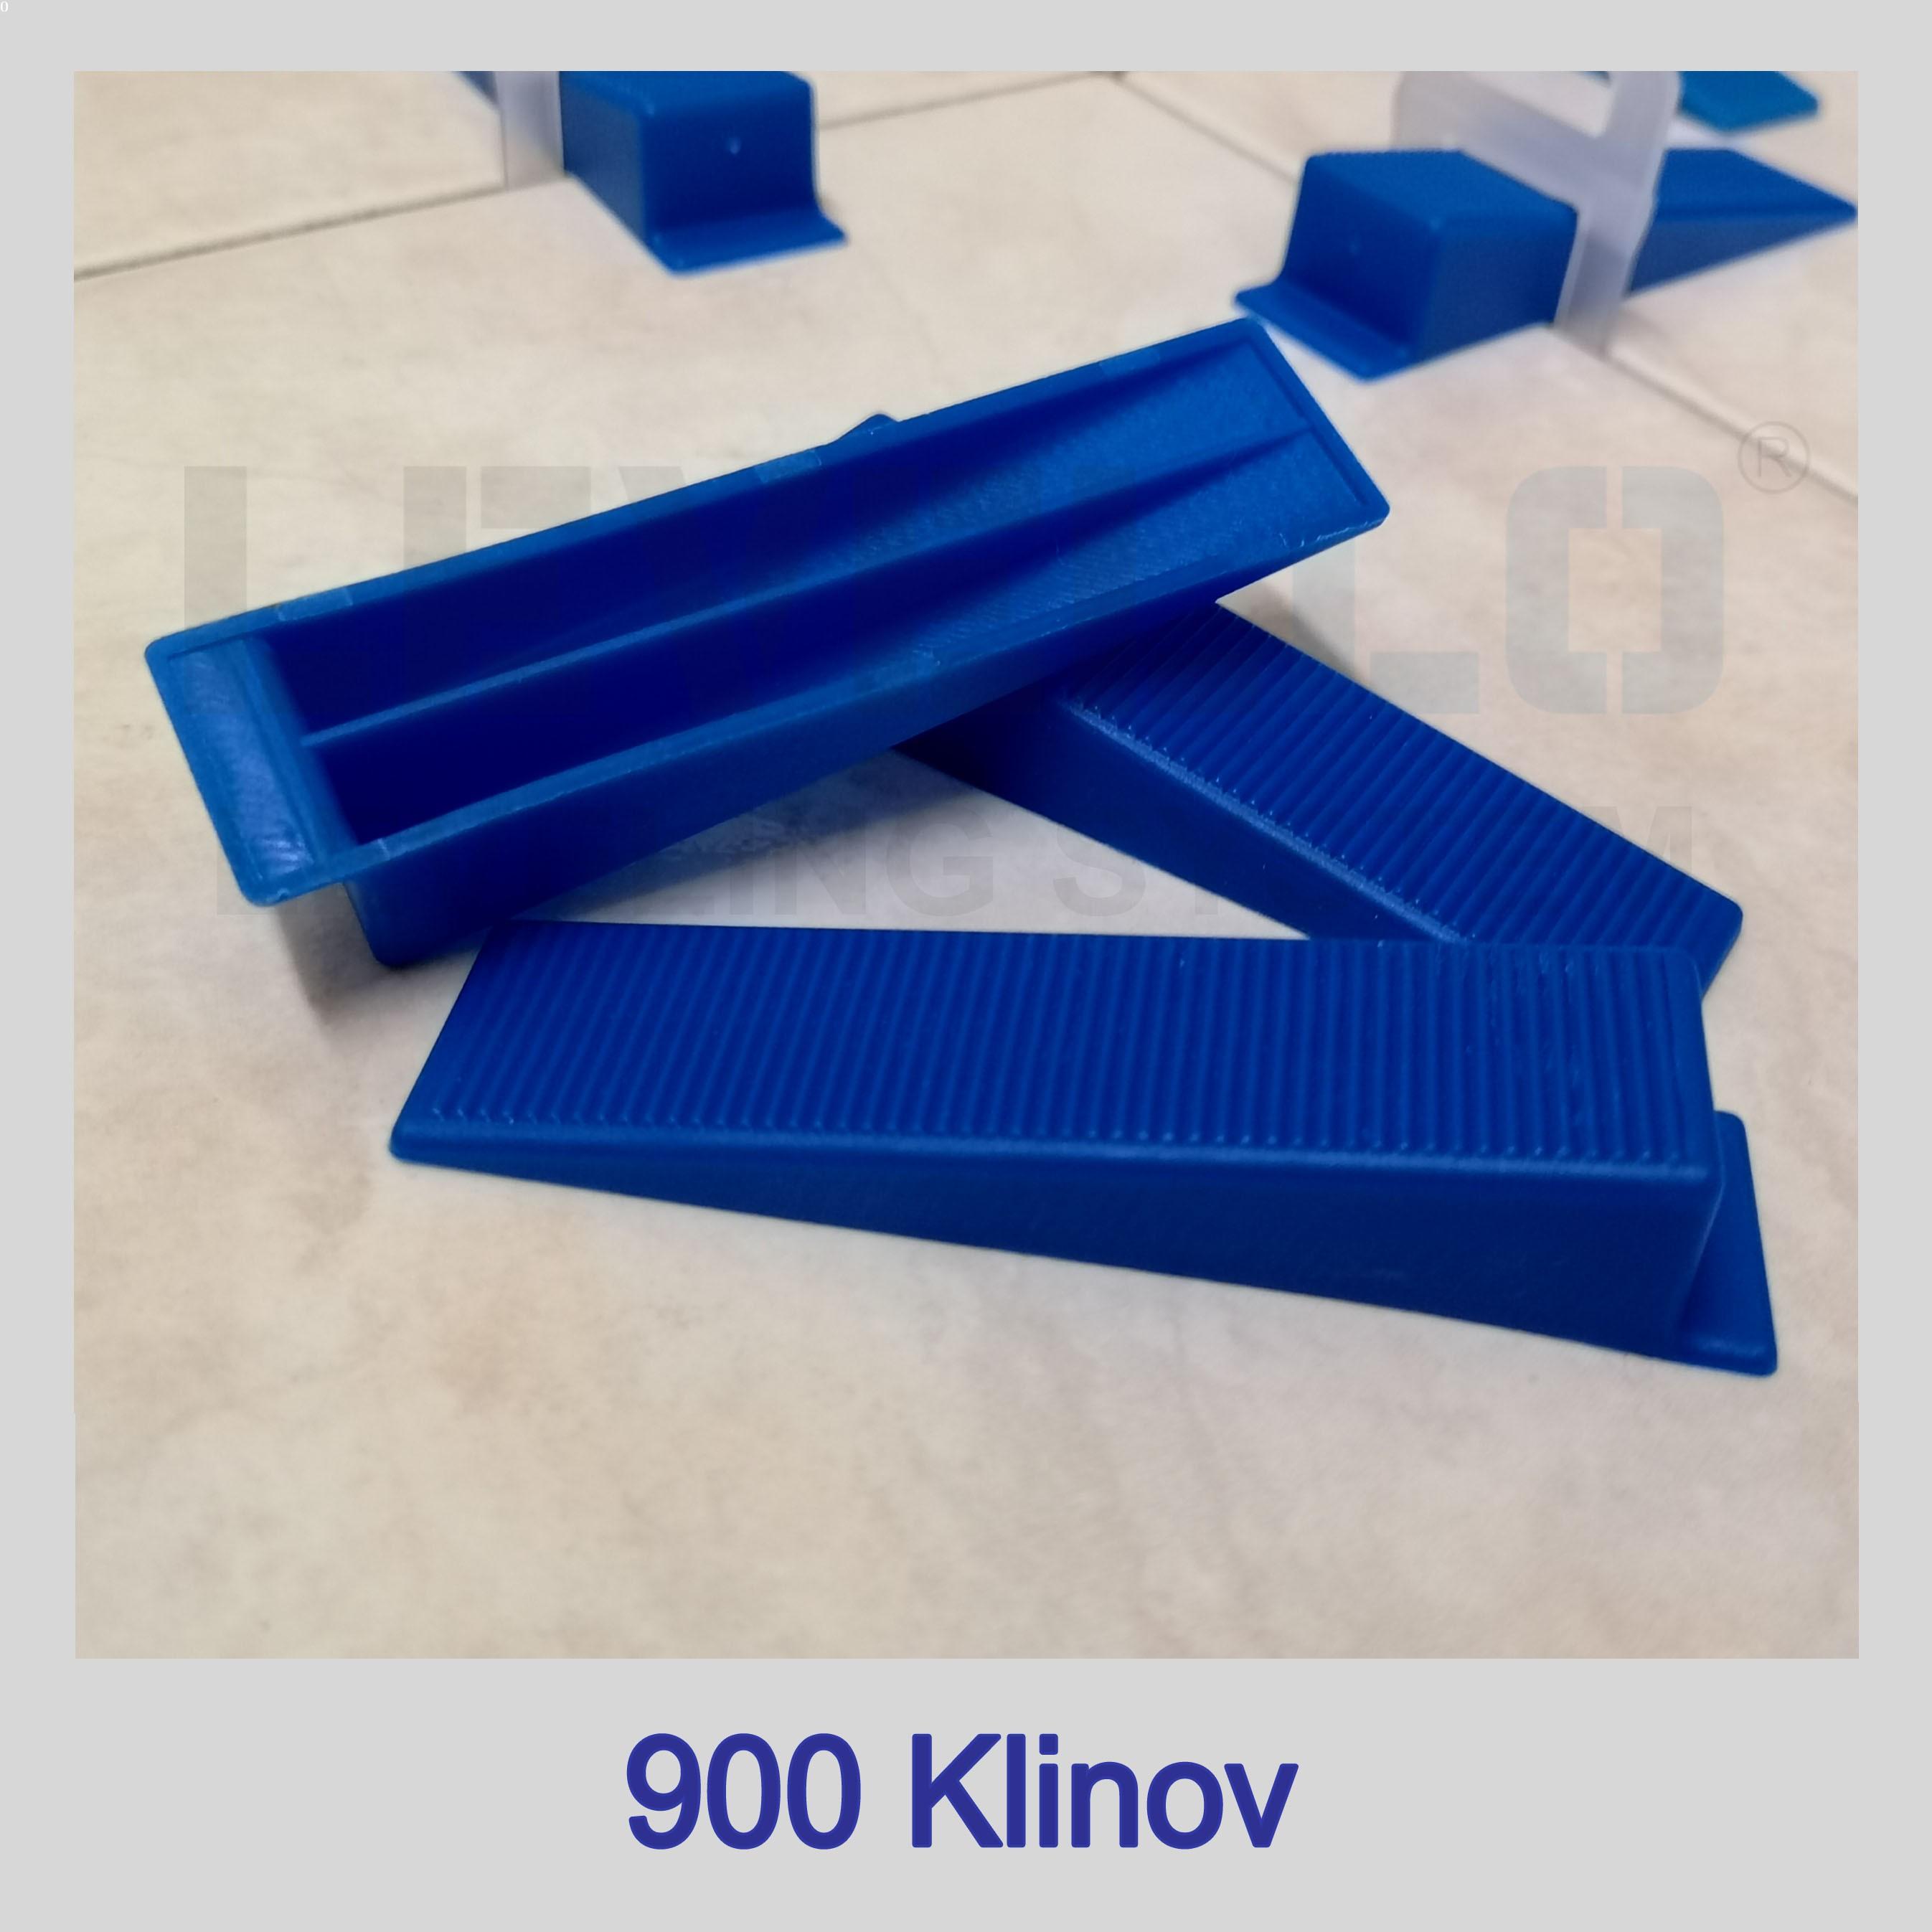 Nivelačné kliny modré, 900 kusov